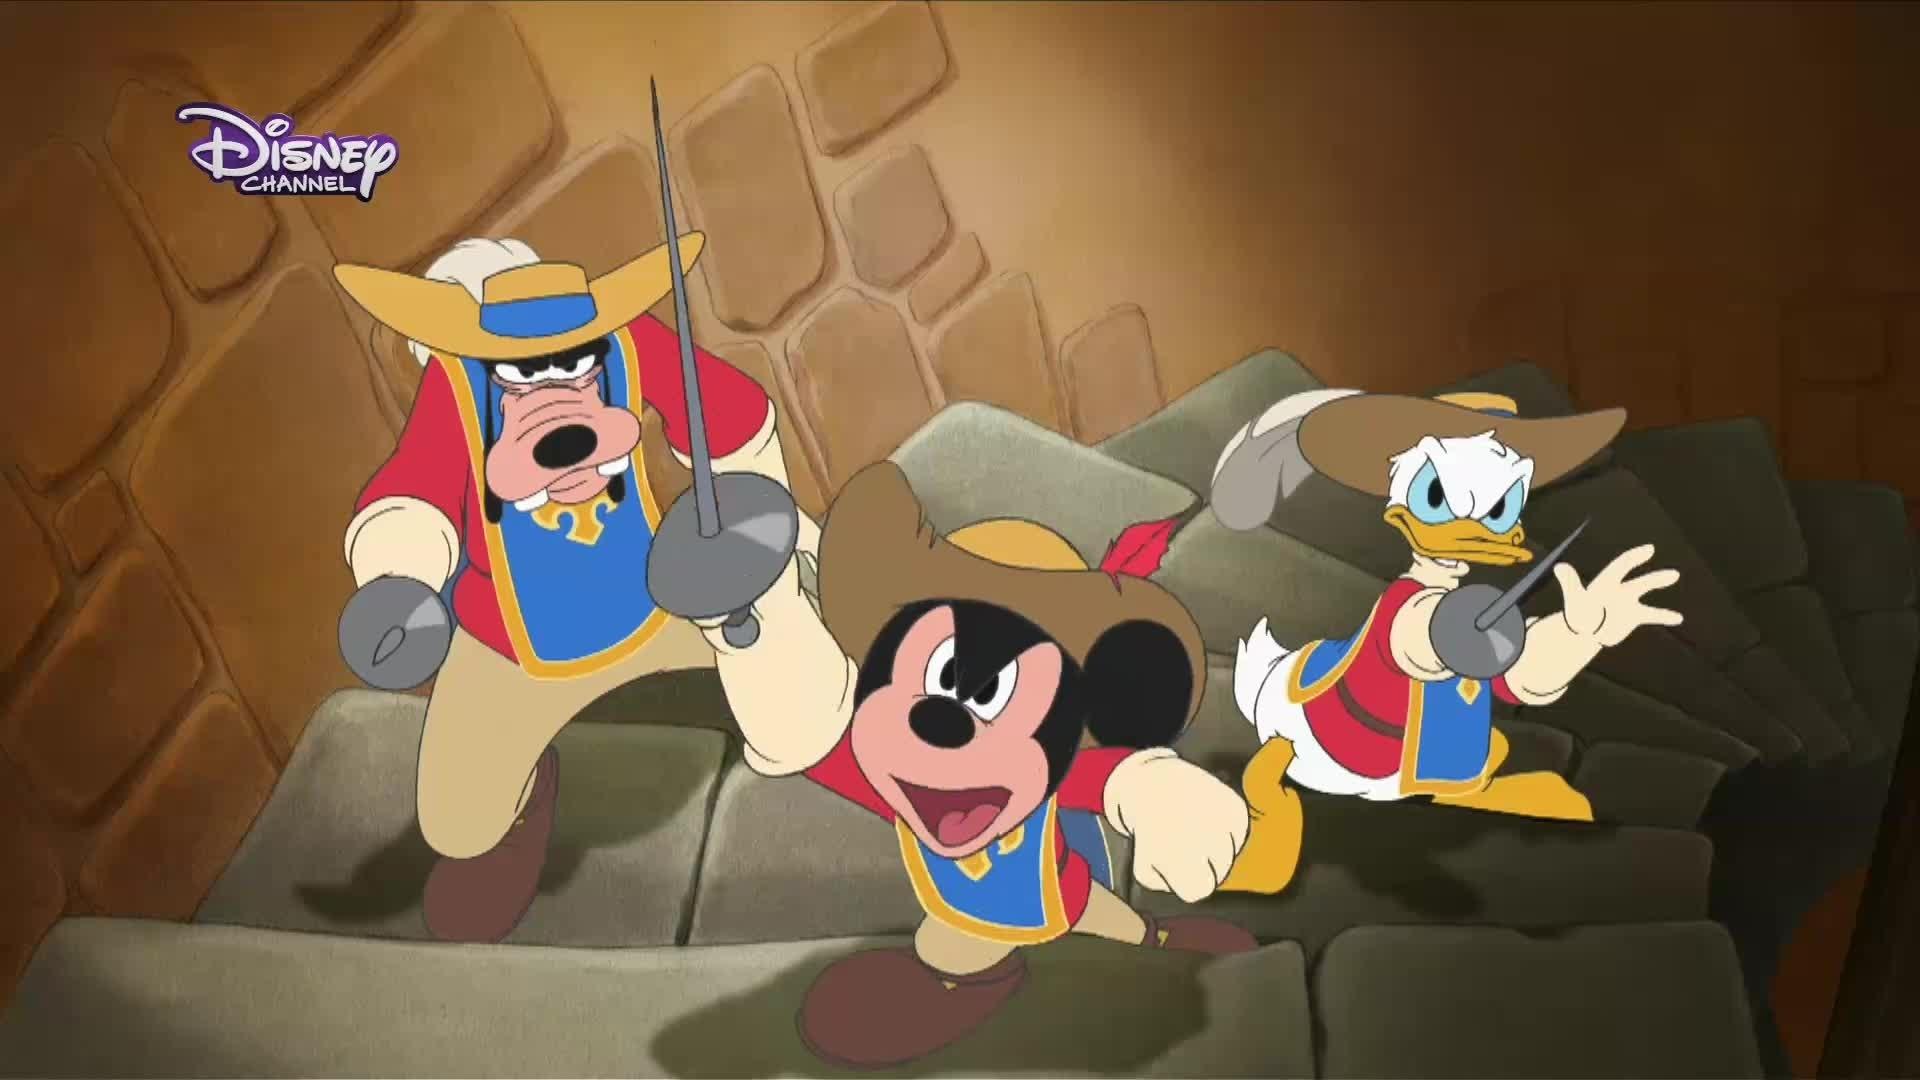 Lieblingsfilm am Samstag: Die drei Musketiere